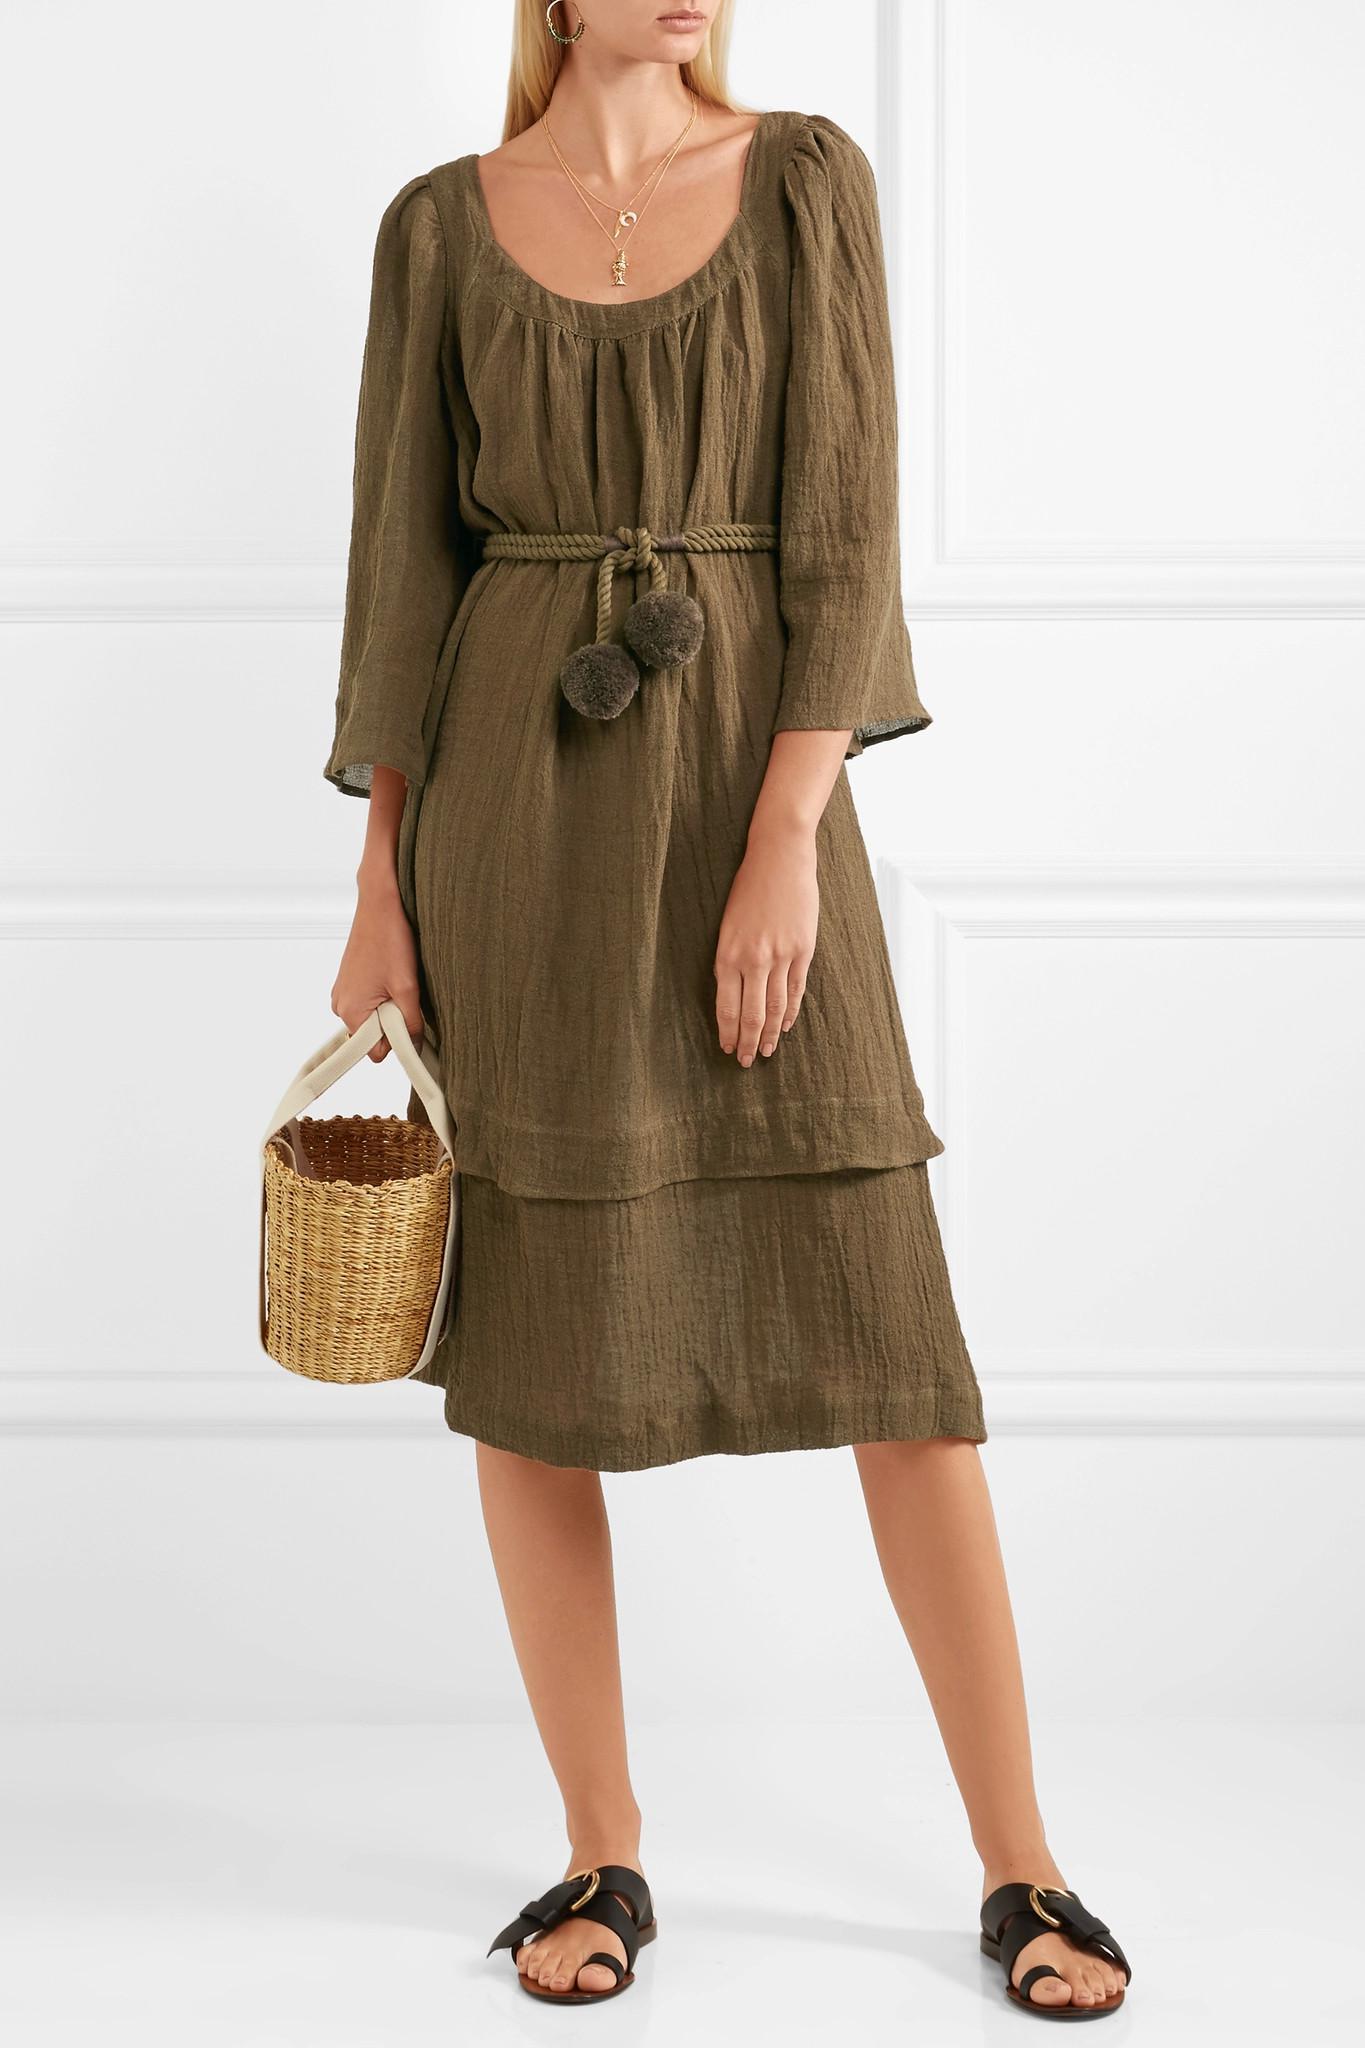 Ilara Pompom-embellished Linen-blend Dress - Army green Three Graces London DJ9rGw